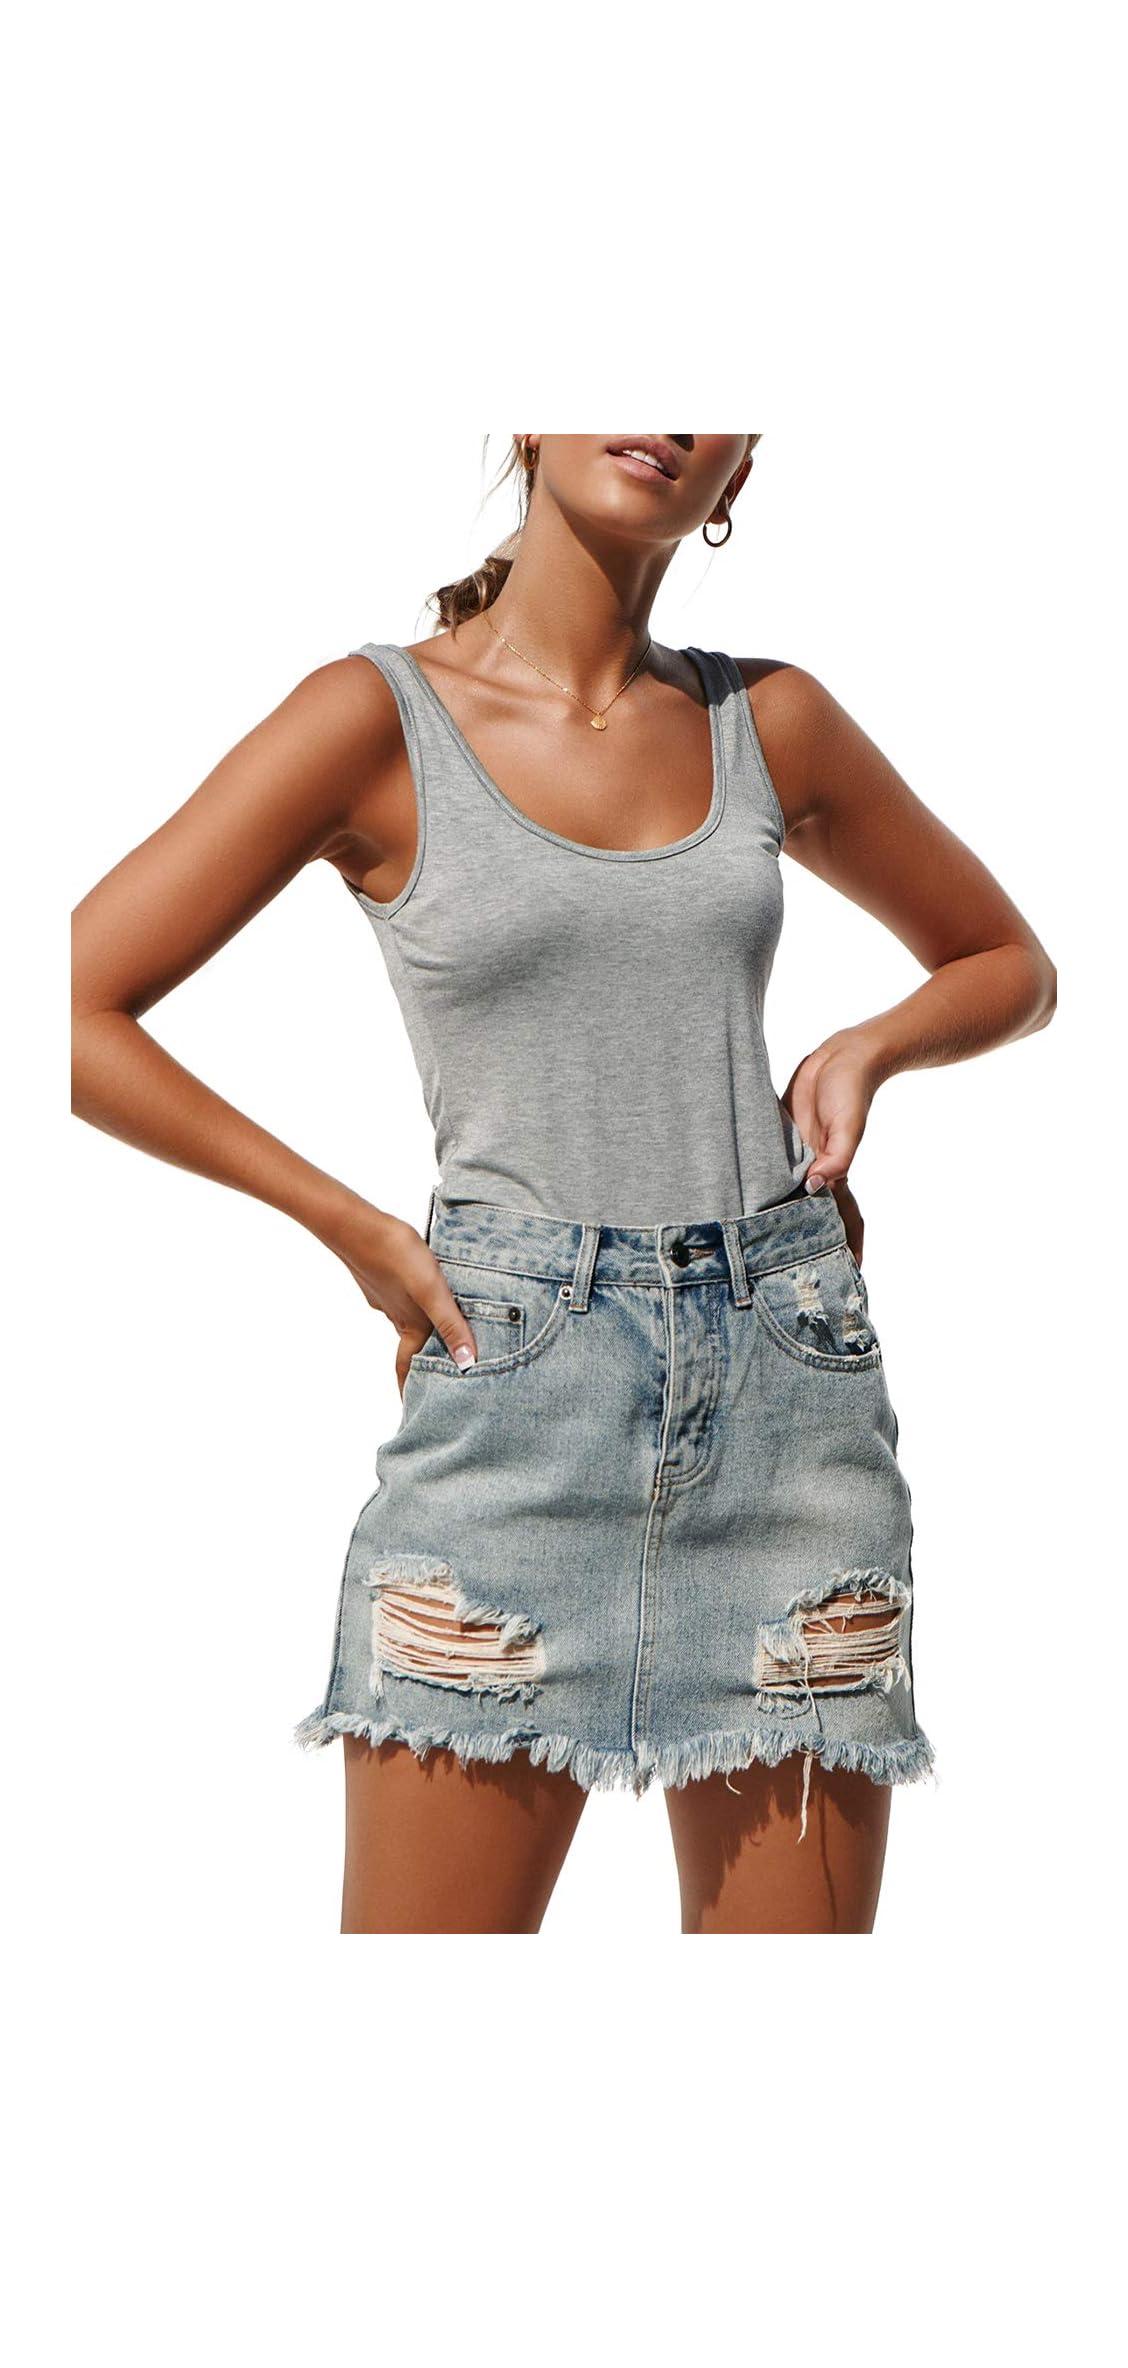 Womens Tank Tops Casual Summer Scoop Neck Sleeveless